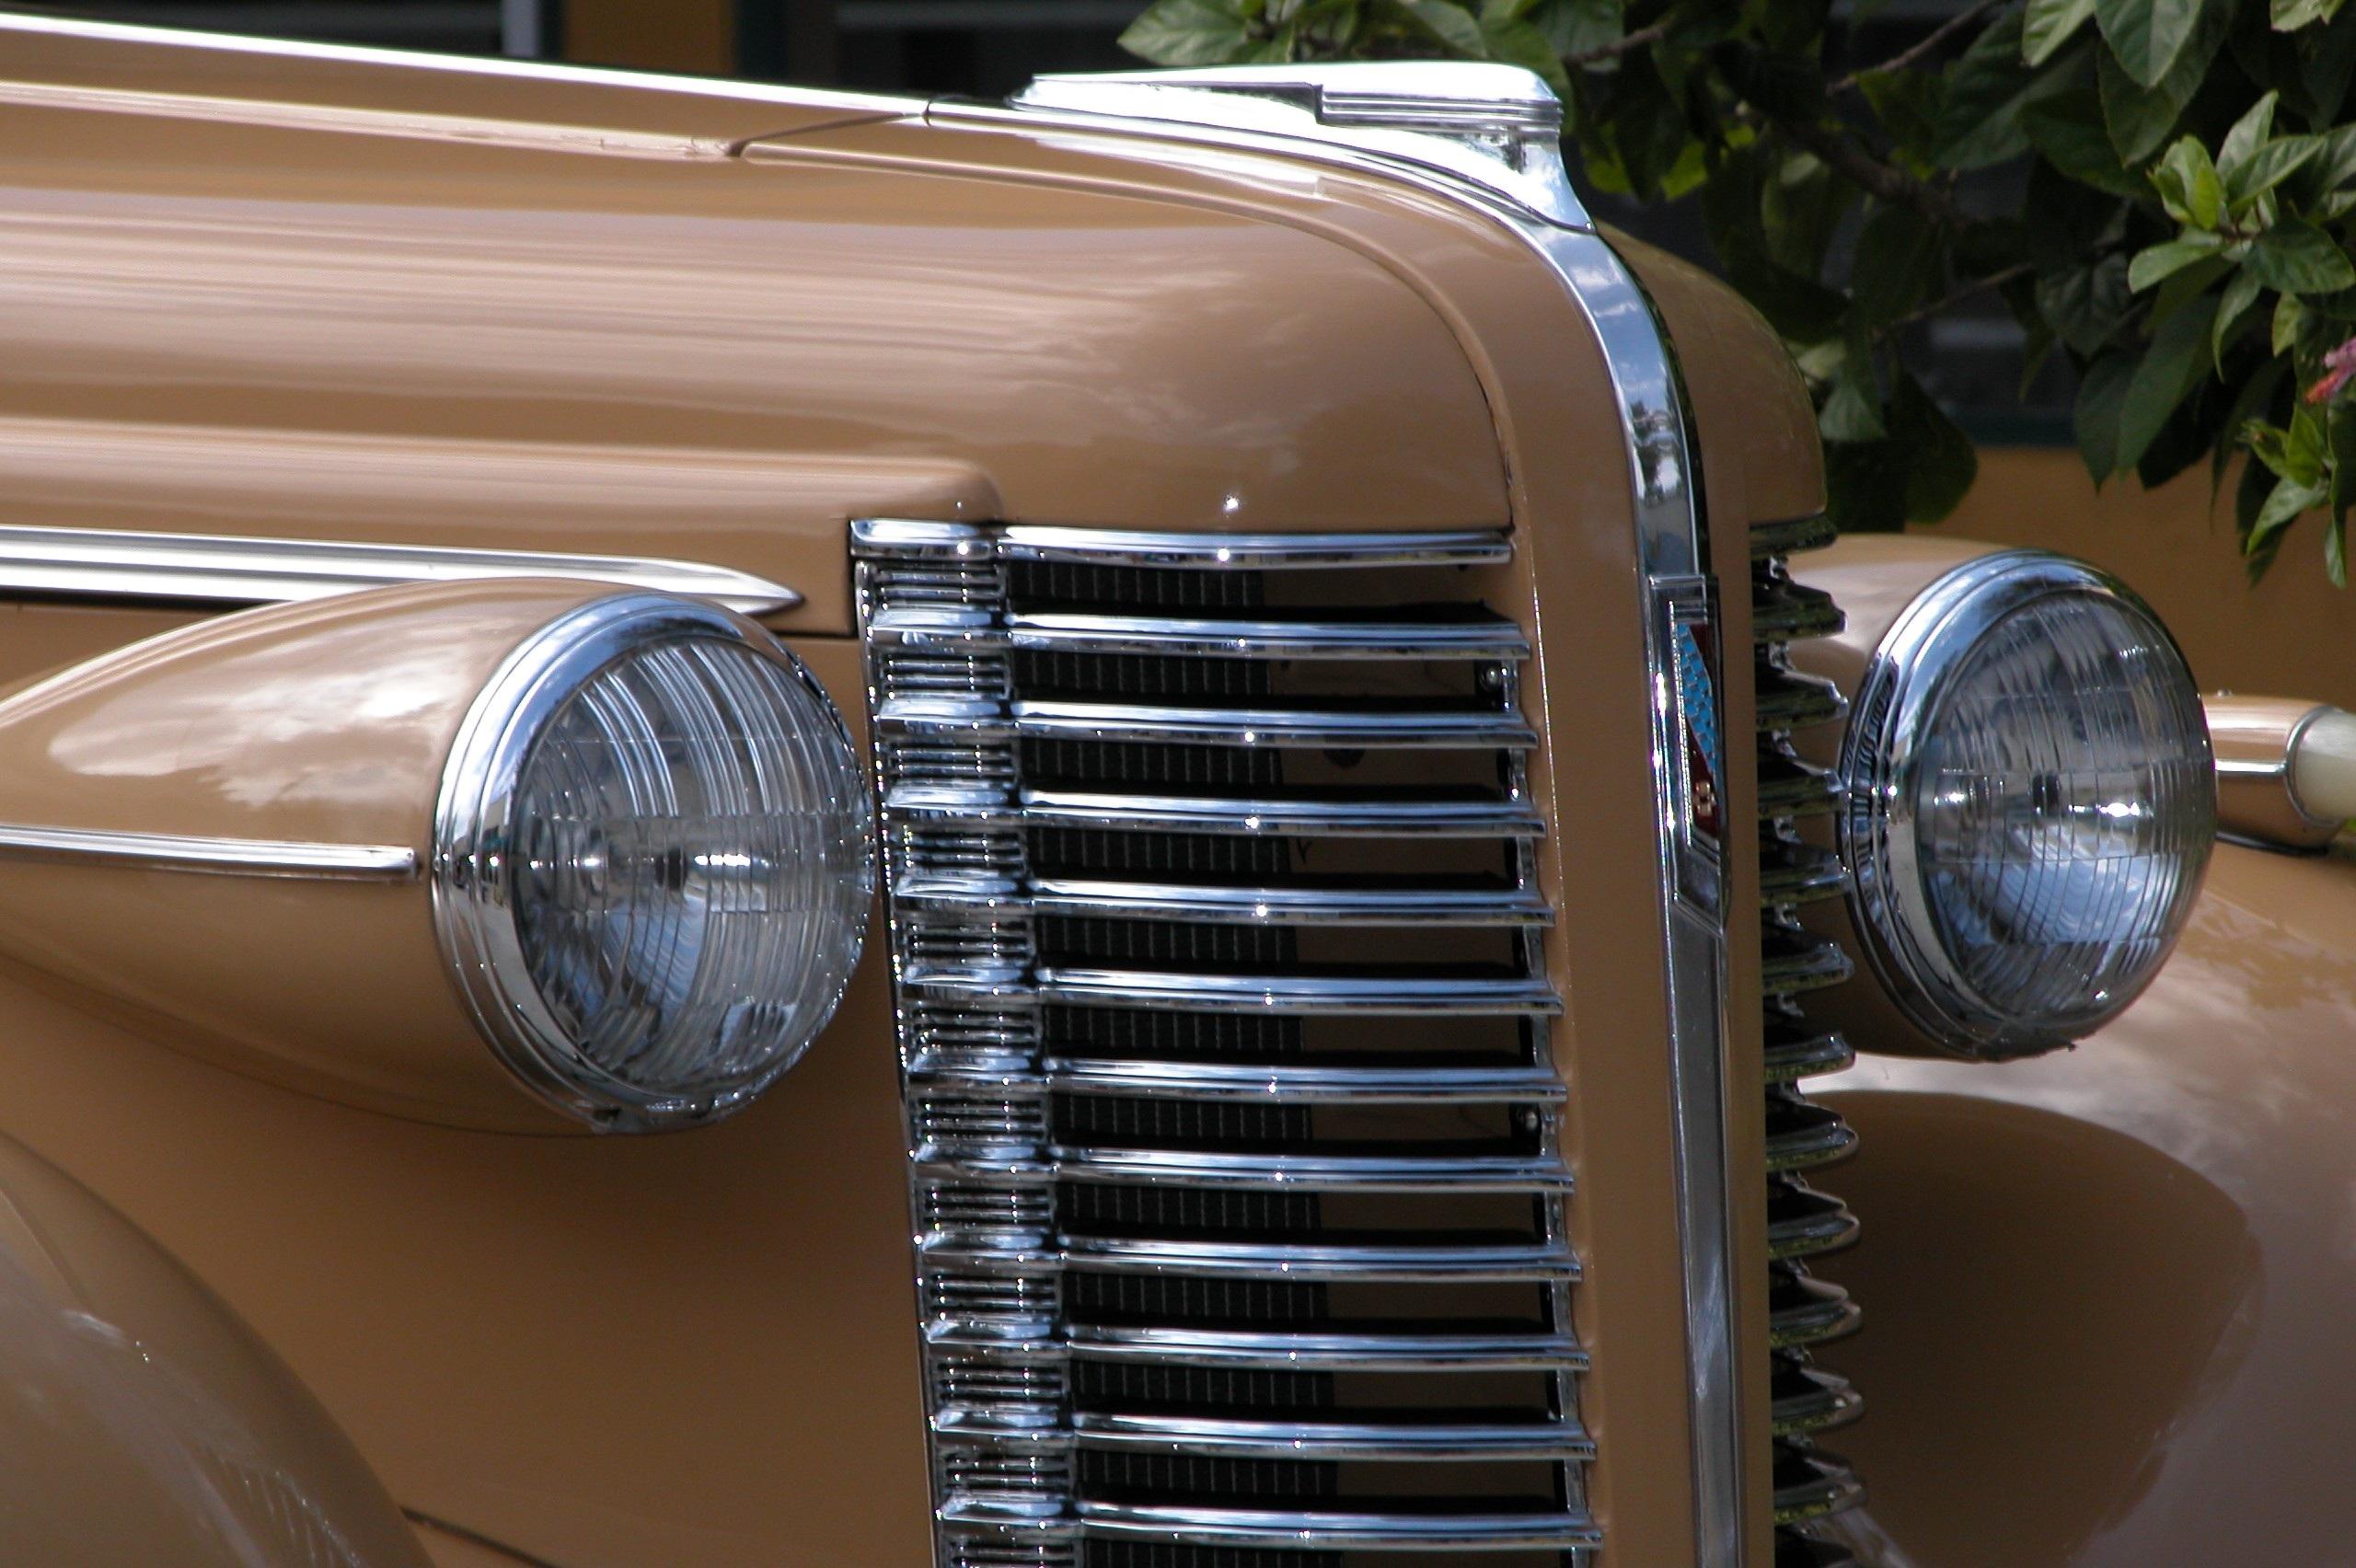 Free Images : wheel, retro, old, transportation, model, drive ...